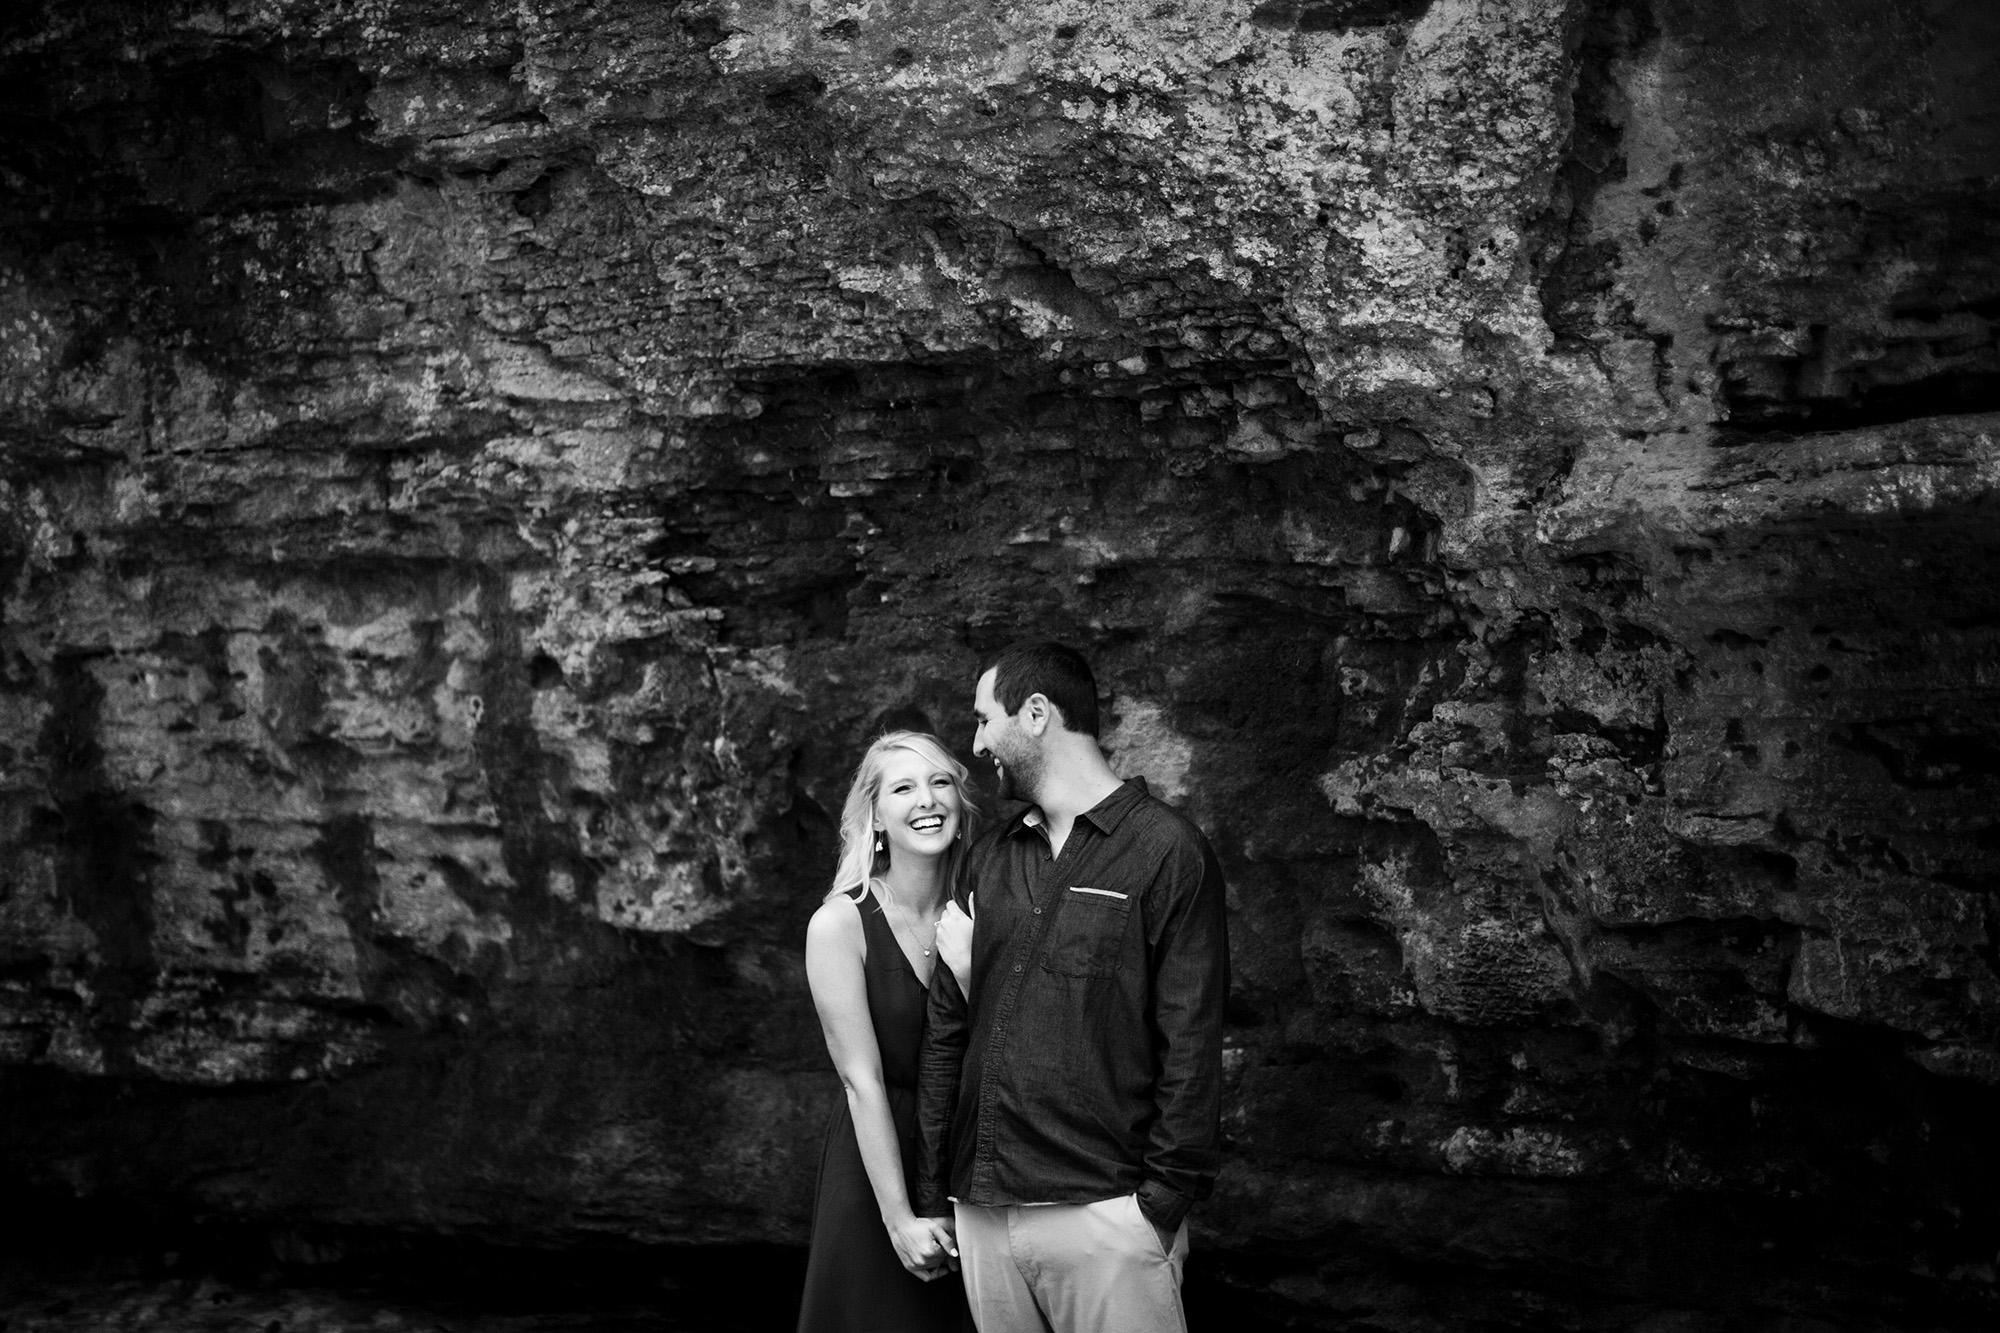 Seriously_Sabrina_Photography_Lexington_Kentucky_Creek_Engagement_AB070.jpg